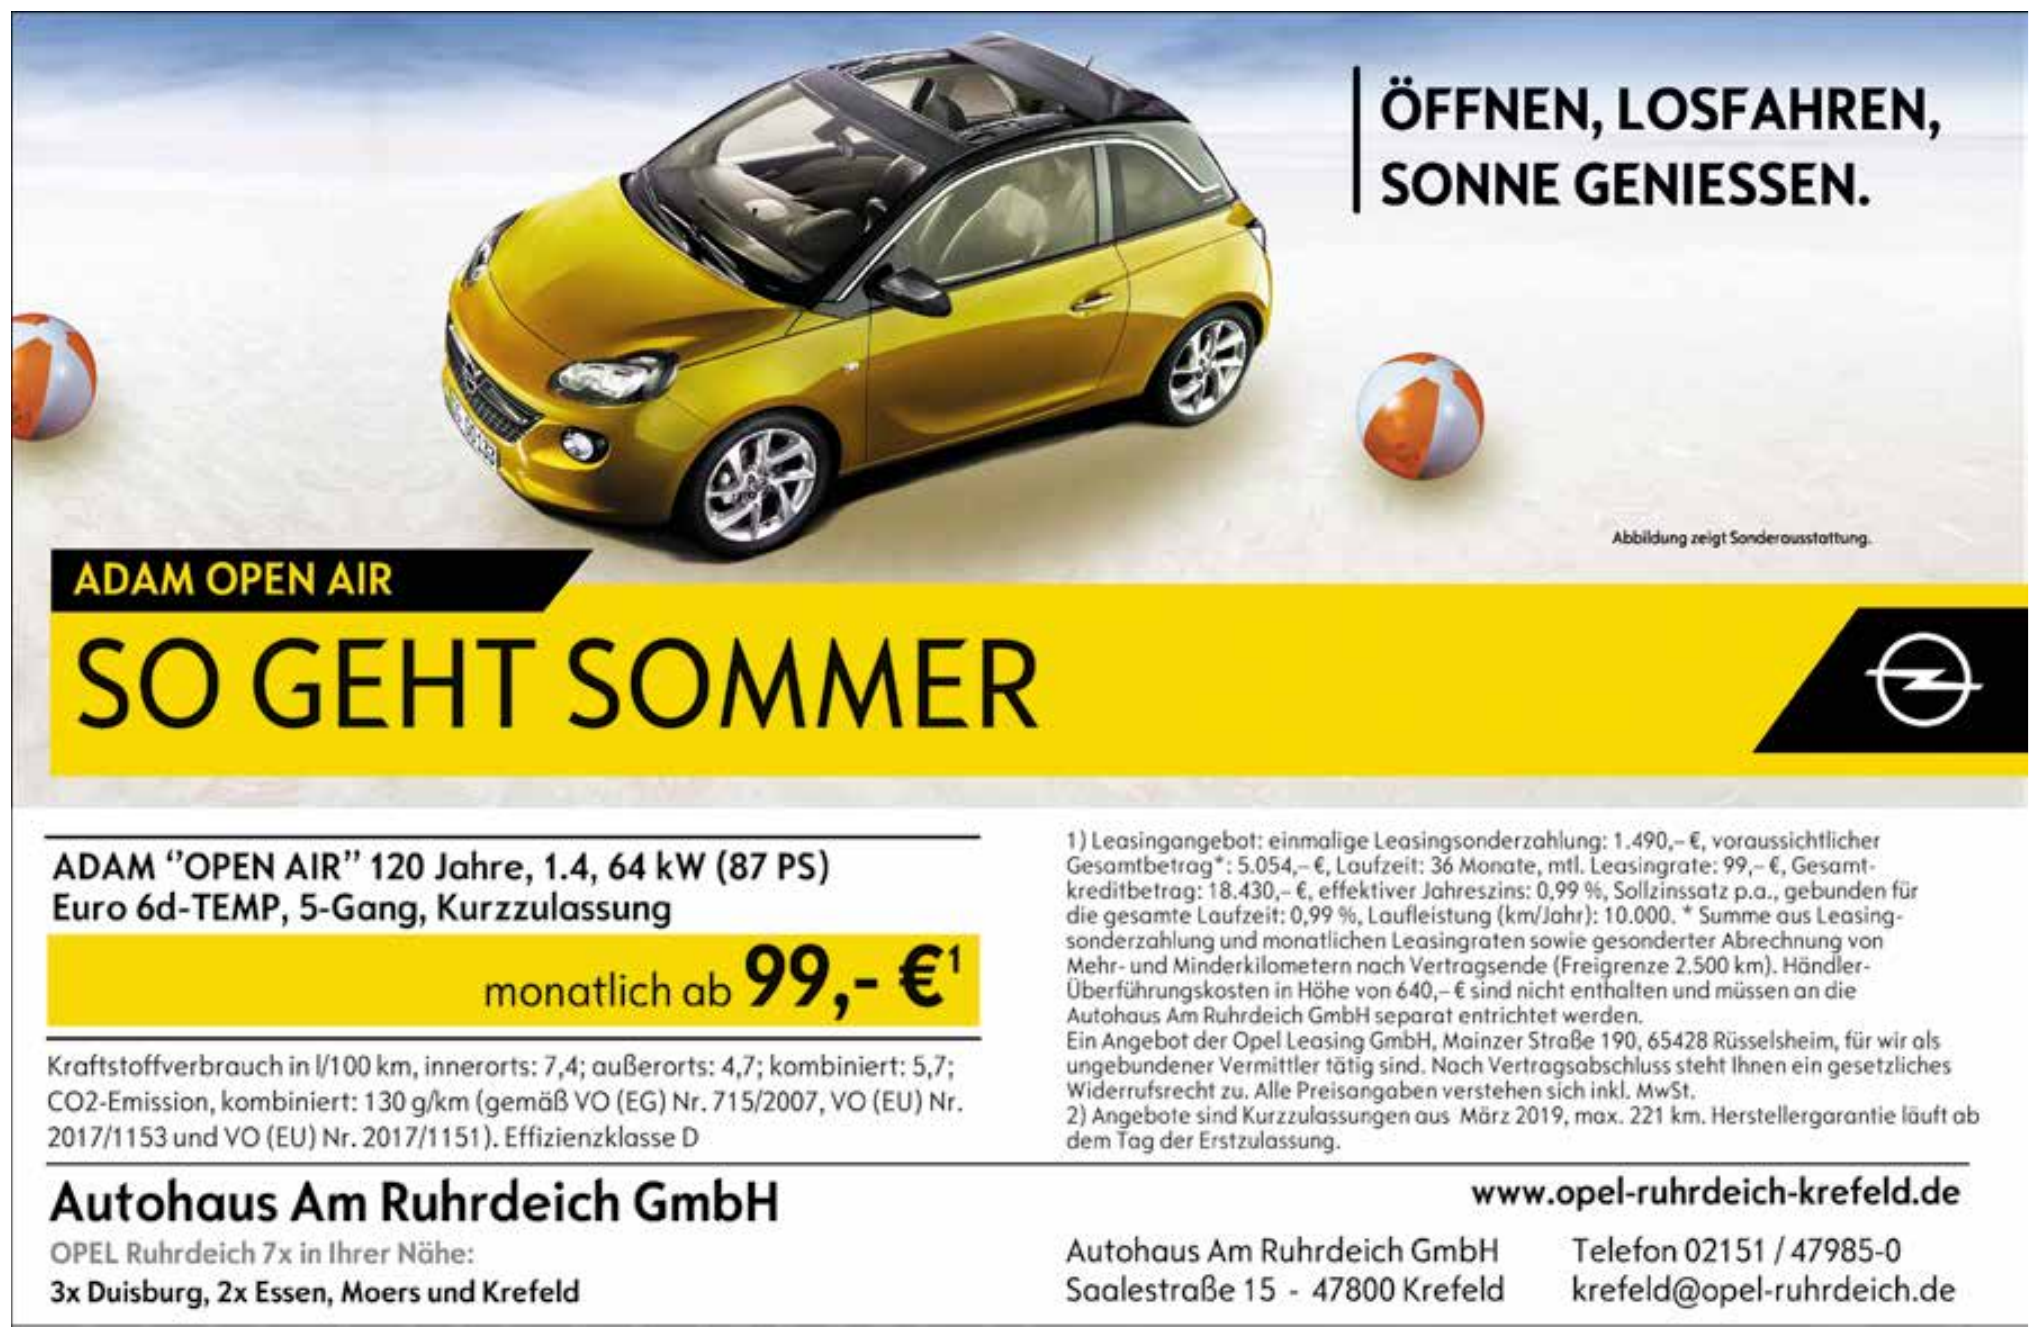 Autohaus Am Ruhrdeich GmbH